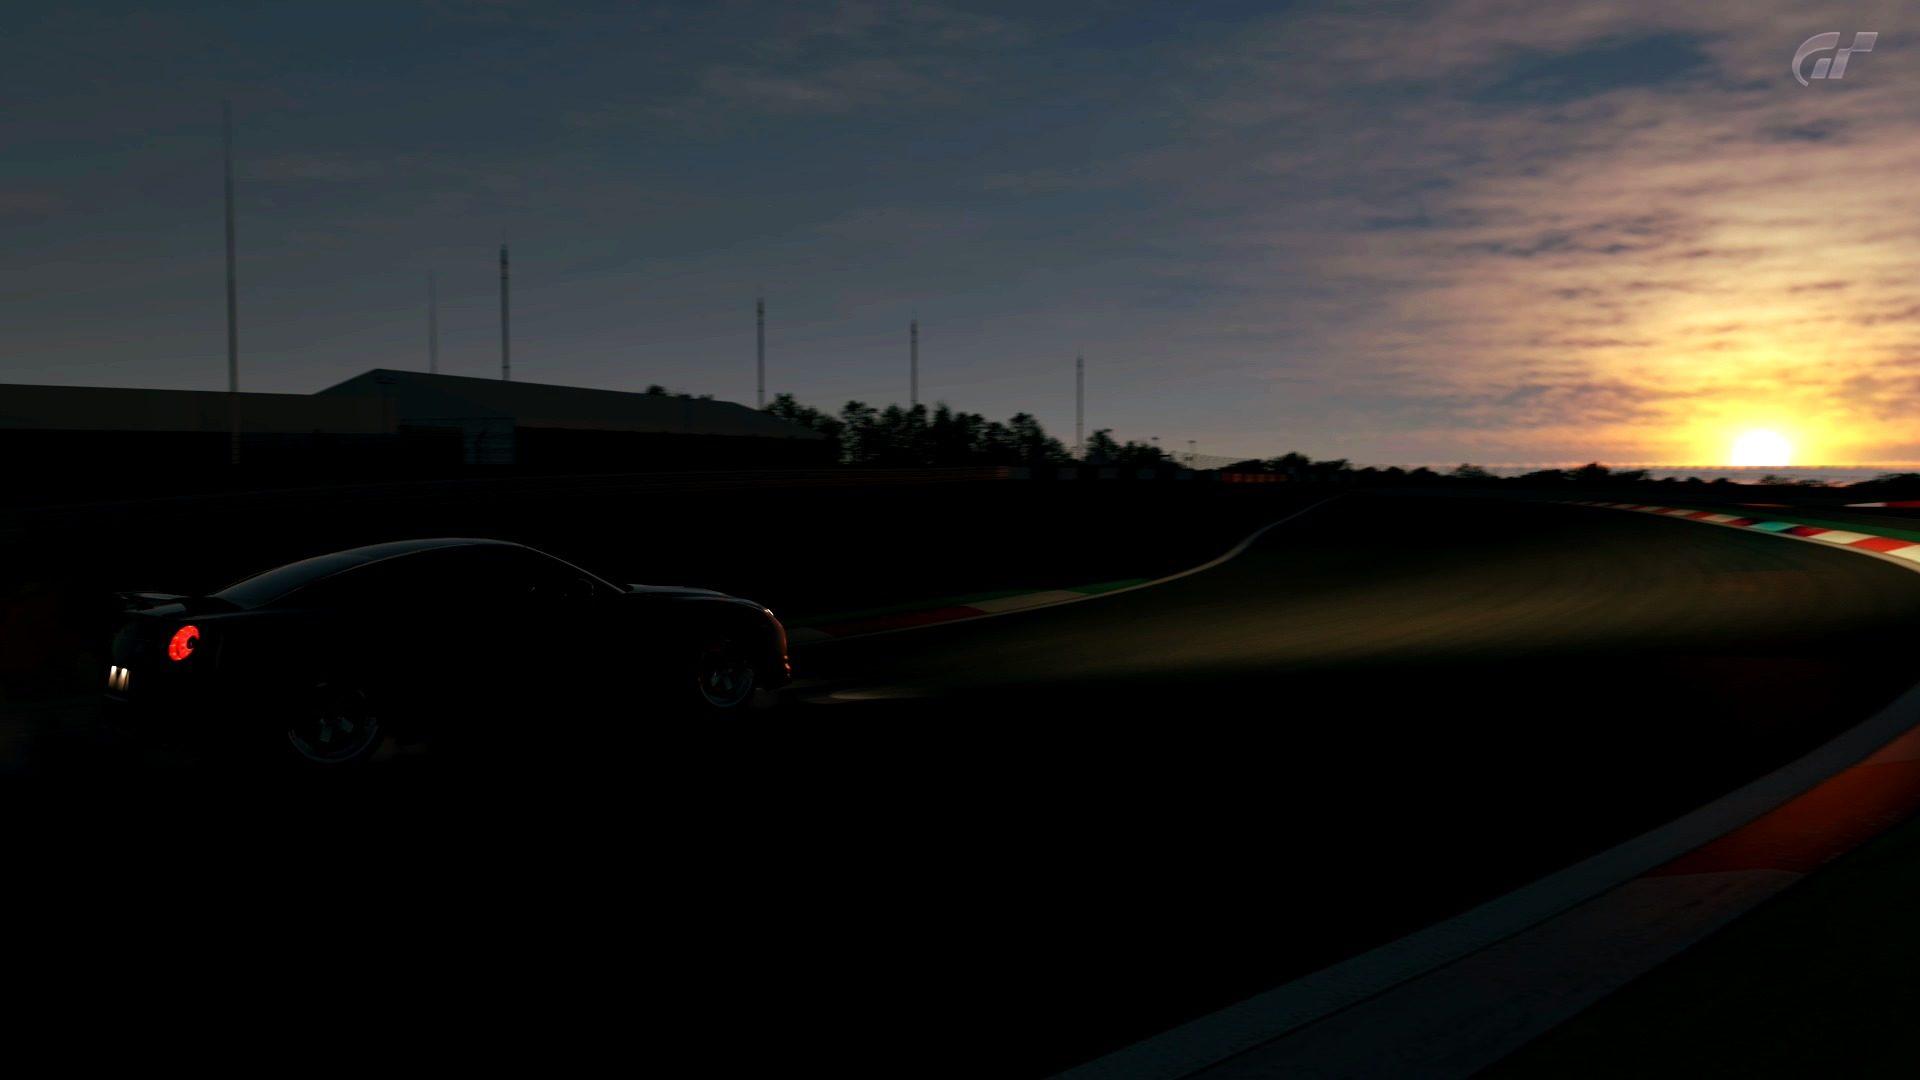 Nürburgring 24h_1_Sunset.jpg